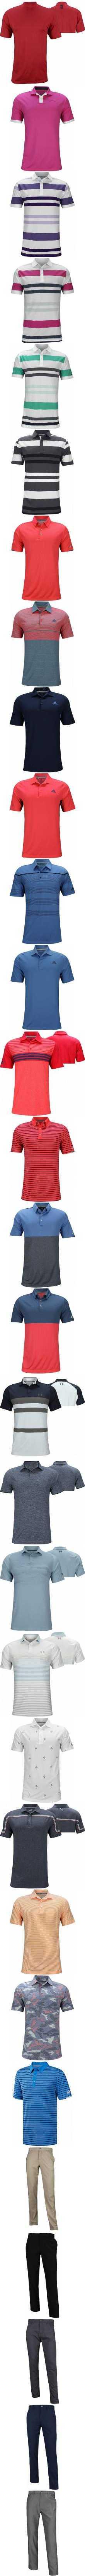 88a811fbf Adidas ClimaChill Core Heather Golf Shirts - Shock Red - Dustin Johnson  U.S. Open Thursday